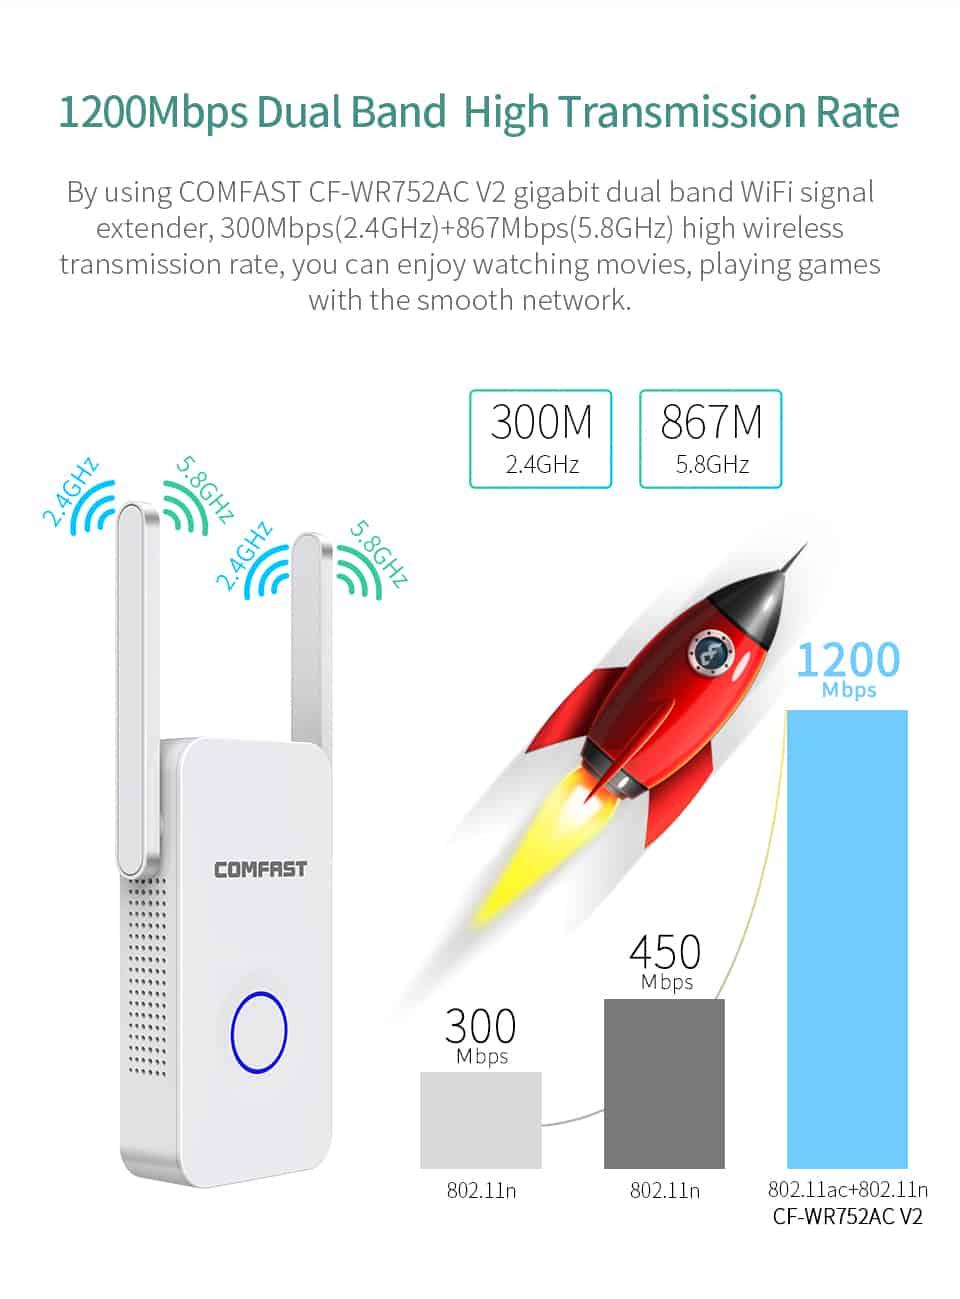 Comfast CF-WR752AC V2 1200Mbps